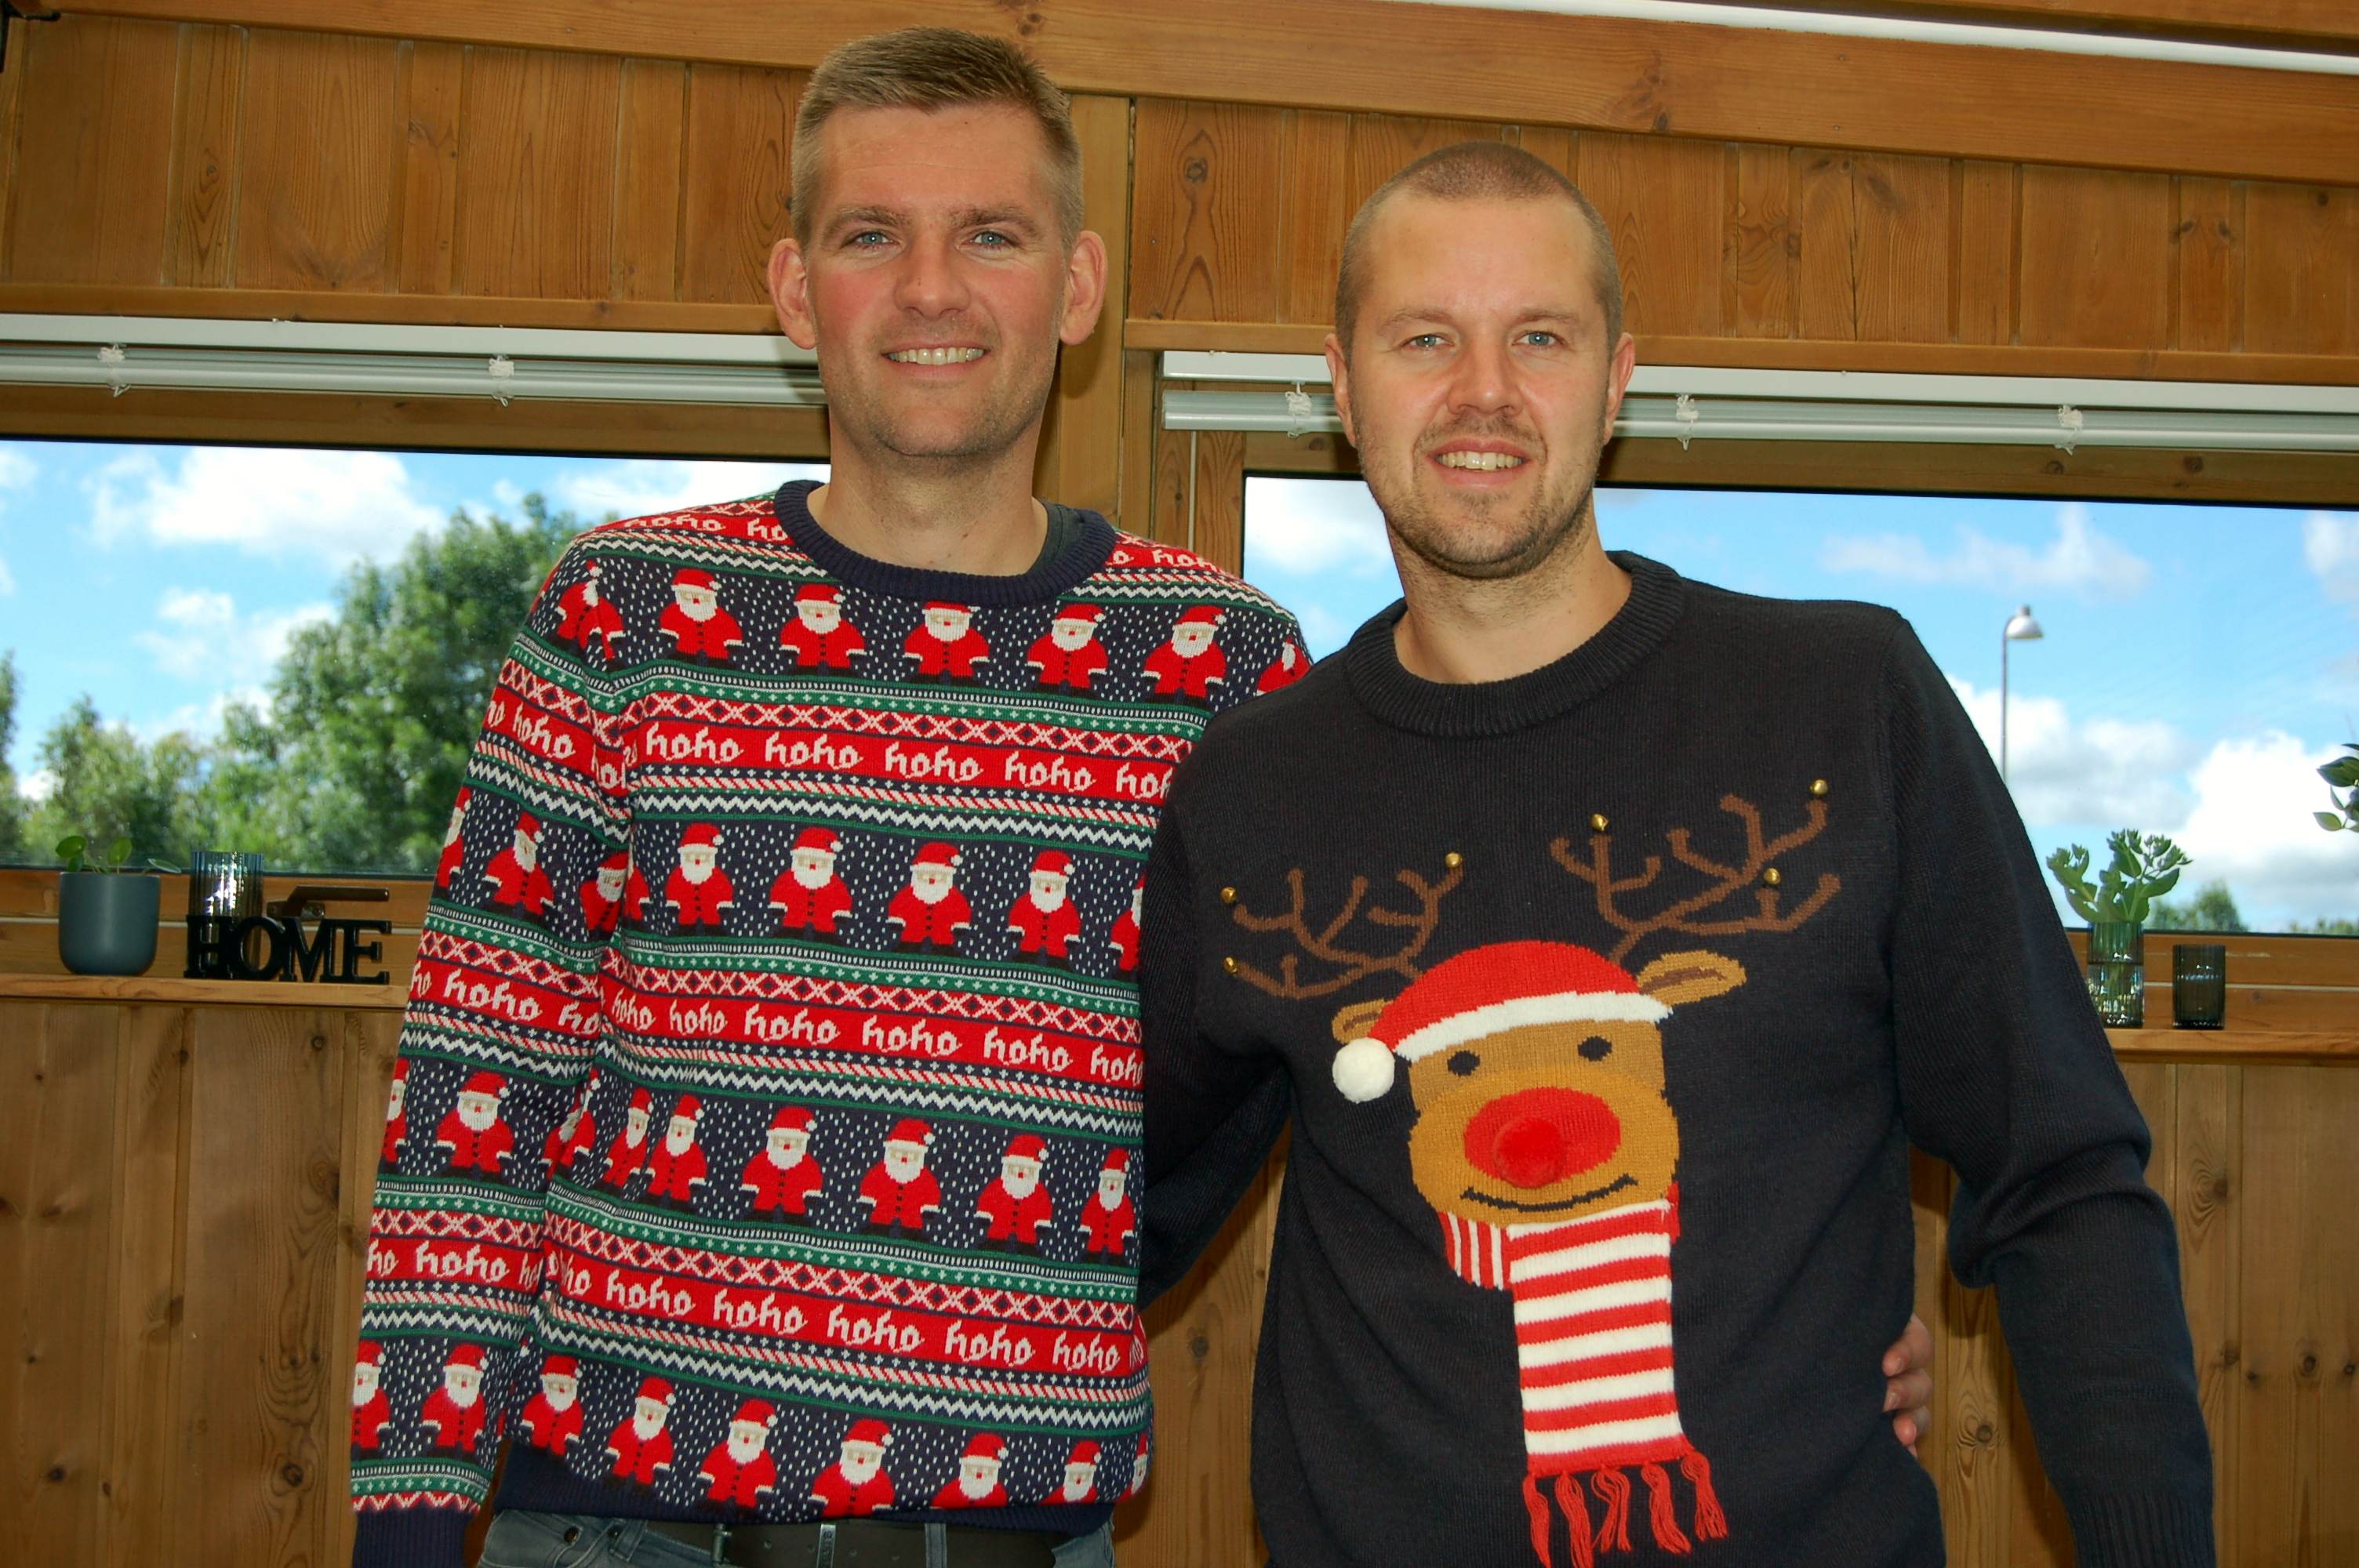 To perfekte eksemplarer på en julesweater